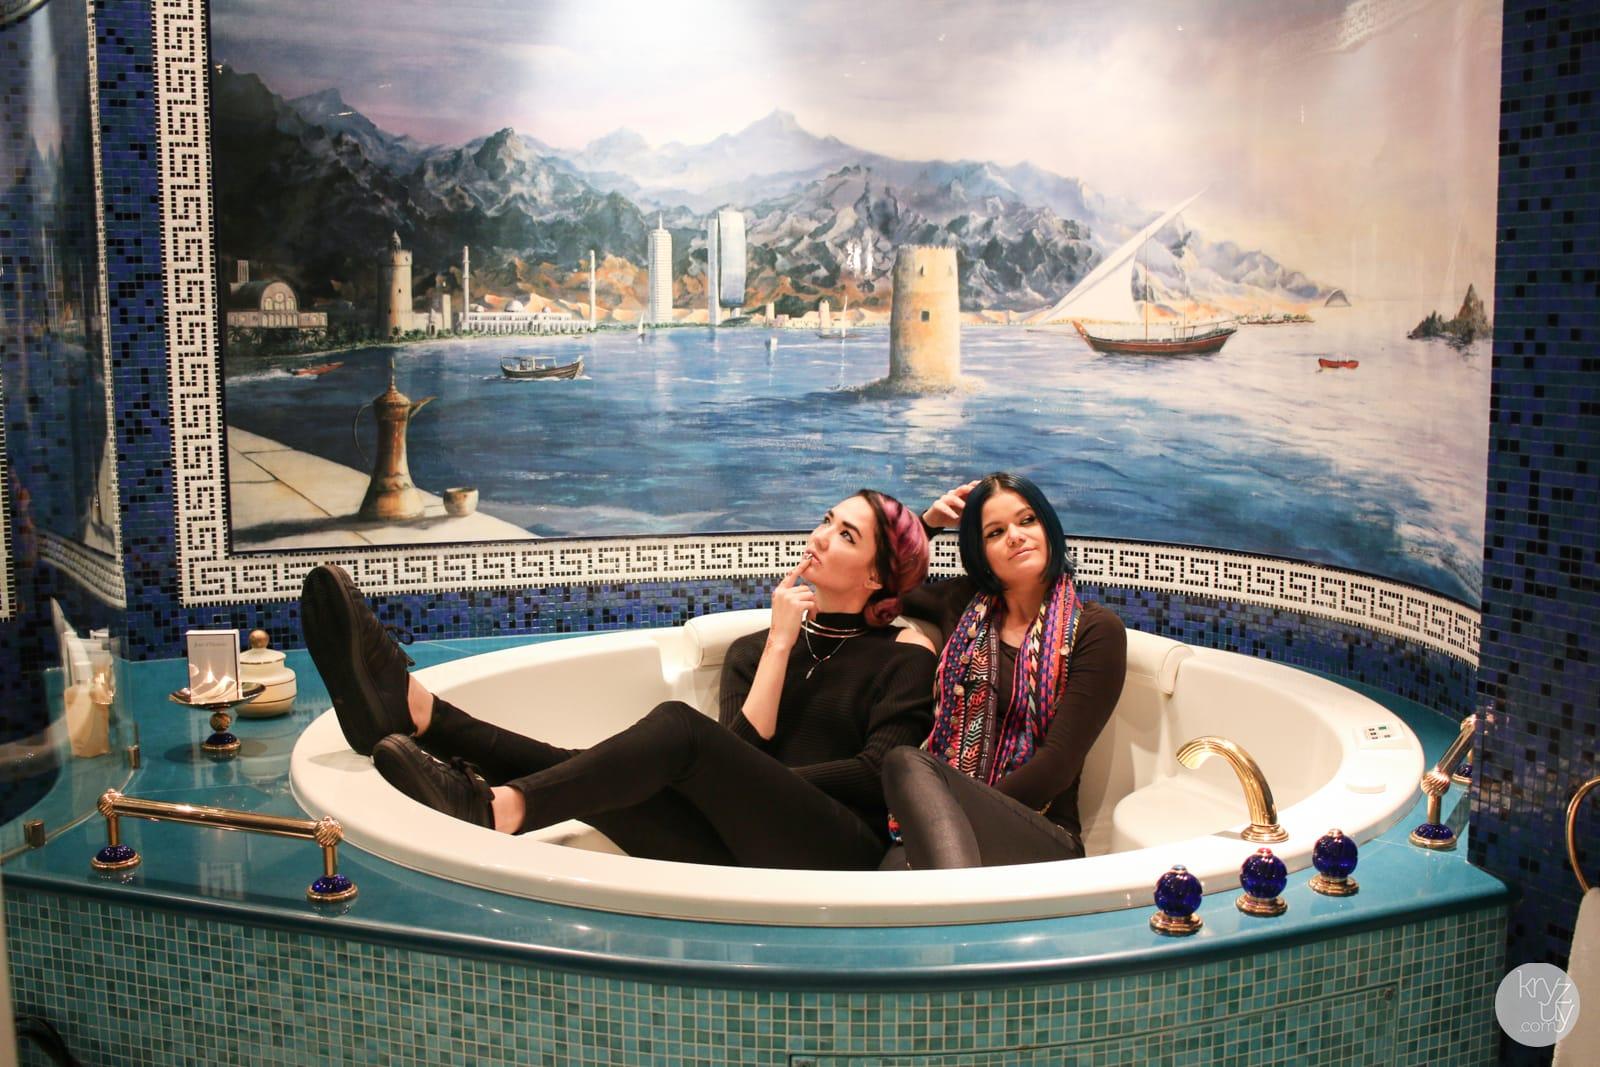 Inside The 7 Star Hotel Burj Al Arab Thirstythought